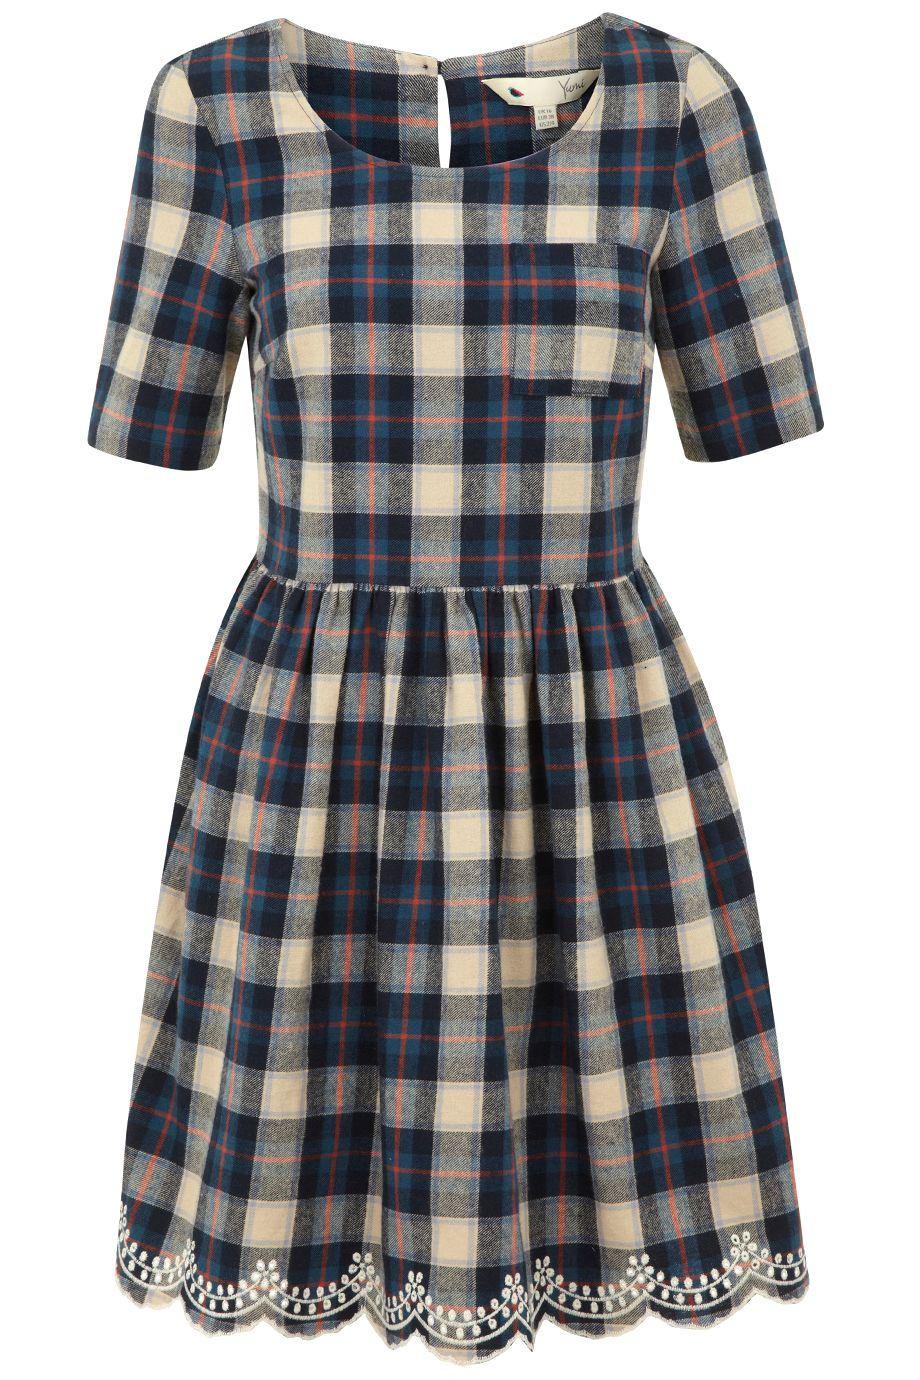 Cheeky in Checks dress by Yumi. Plaid DressNavy DressNavy Blue Skater ...